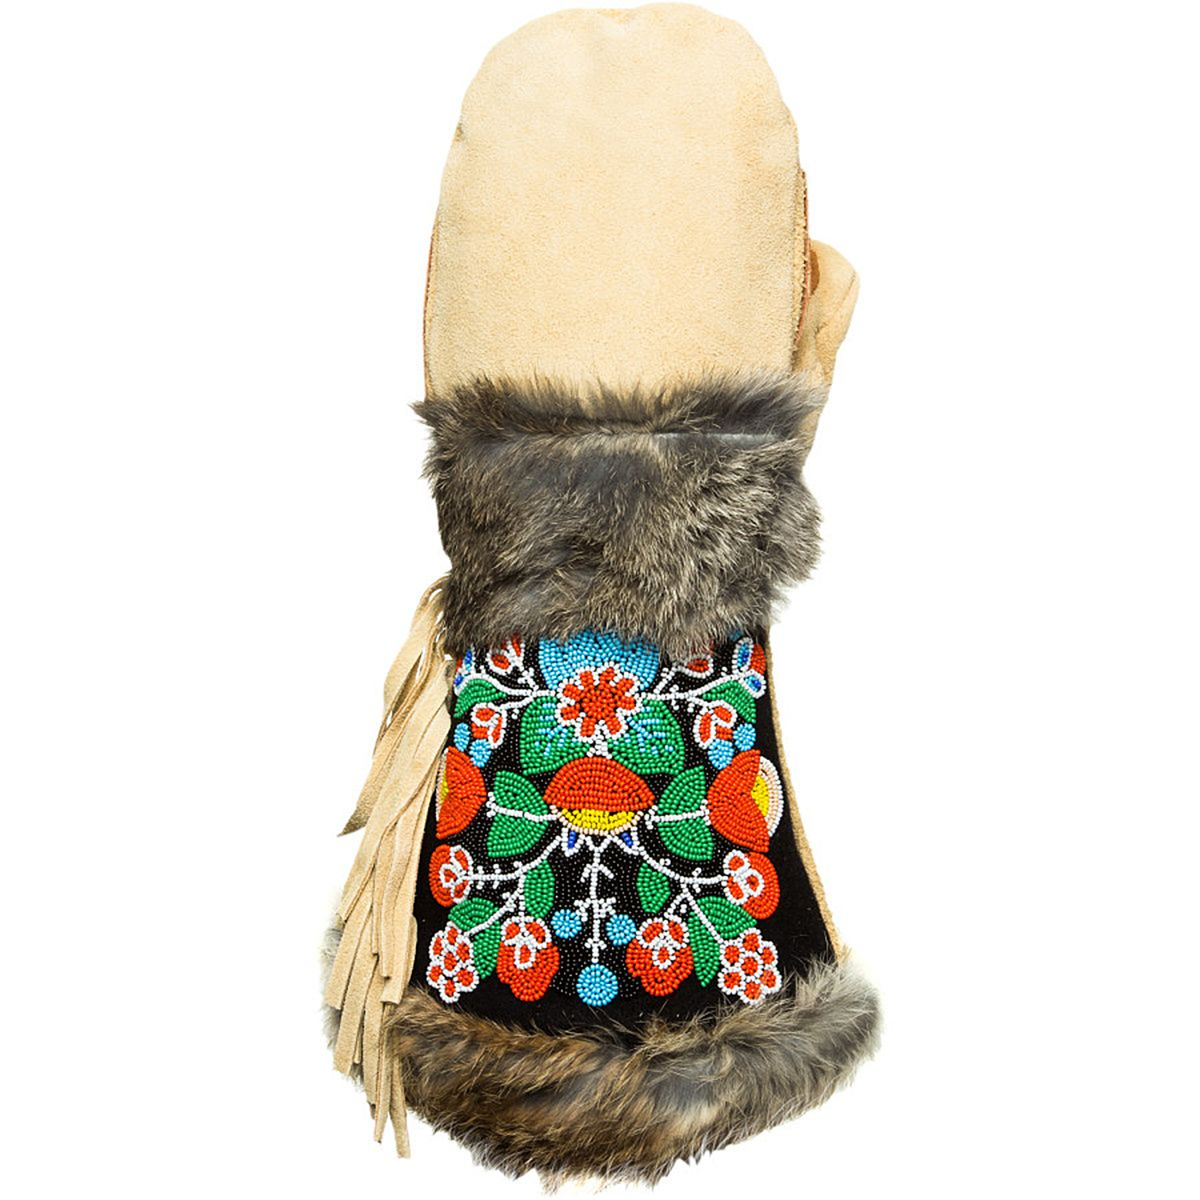 Astis Sacagawea Mitten - Women's